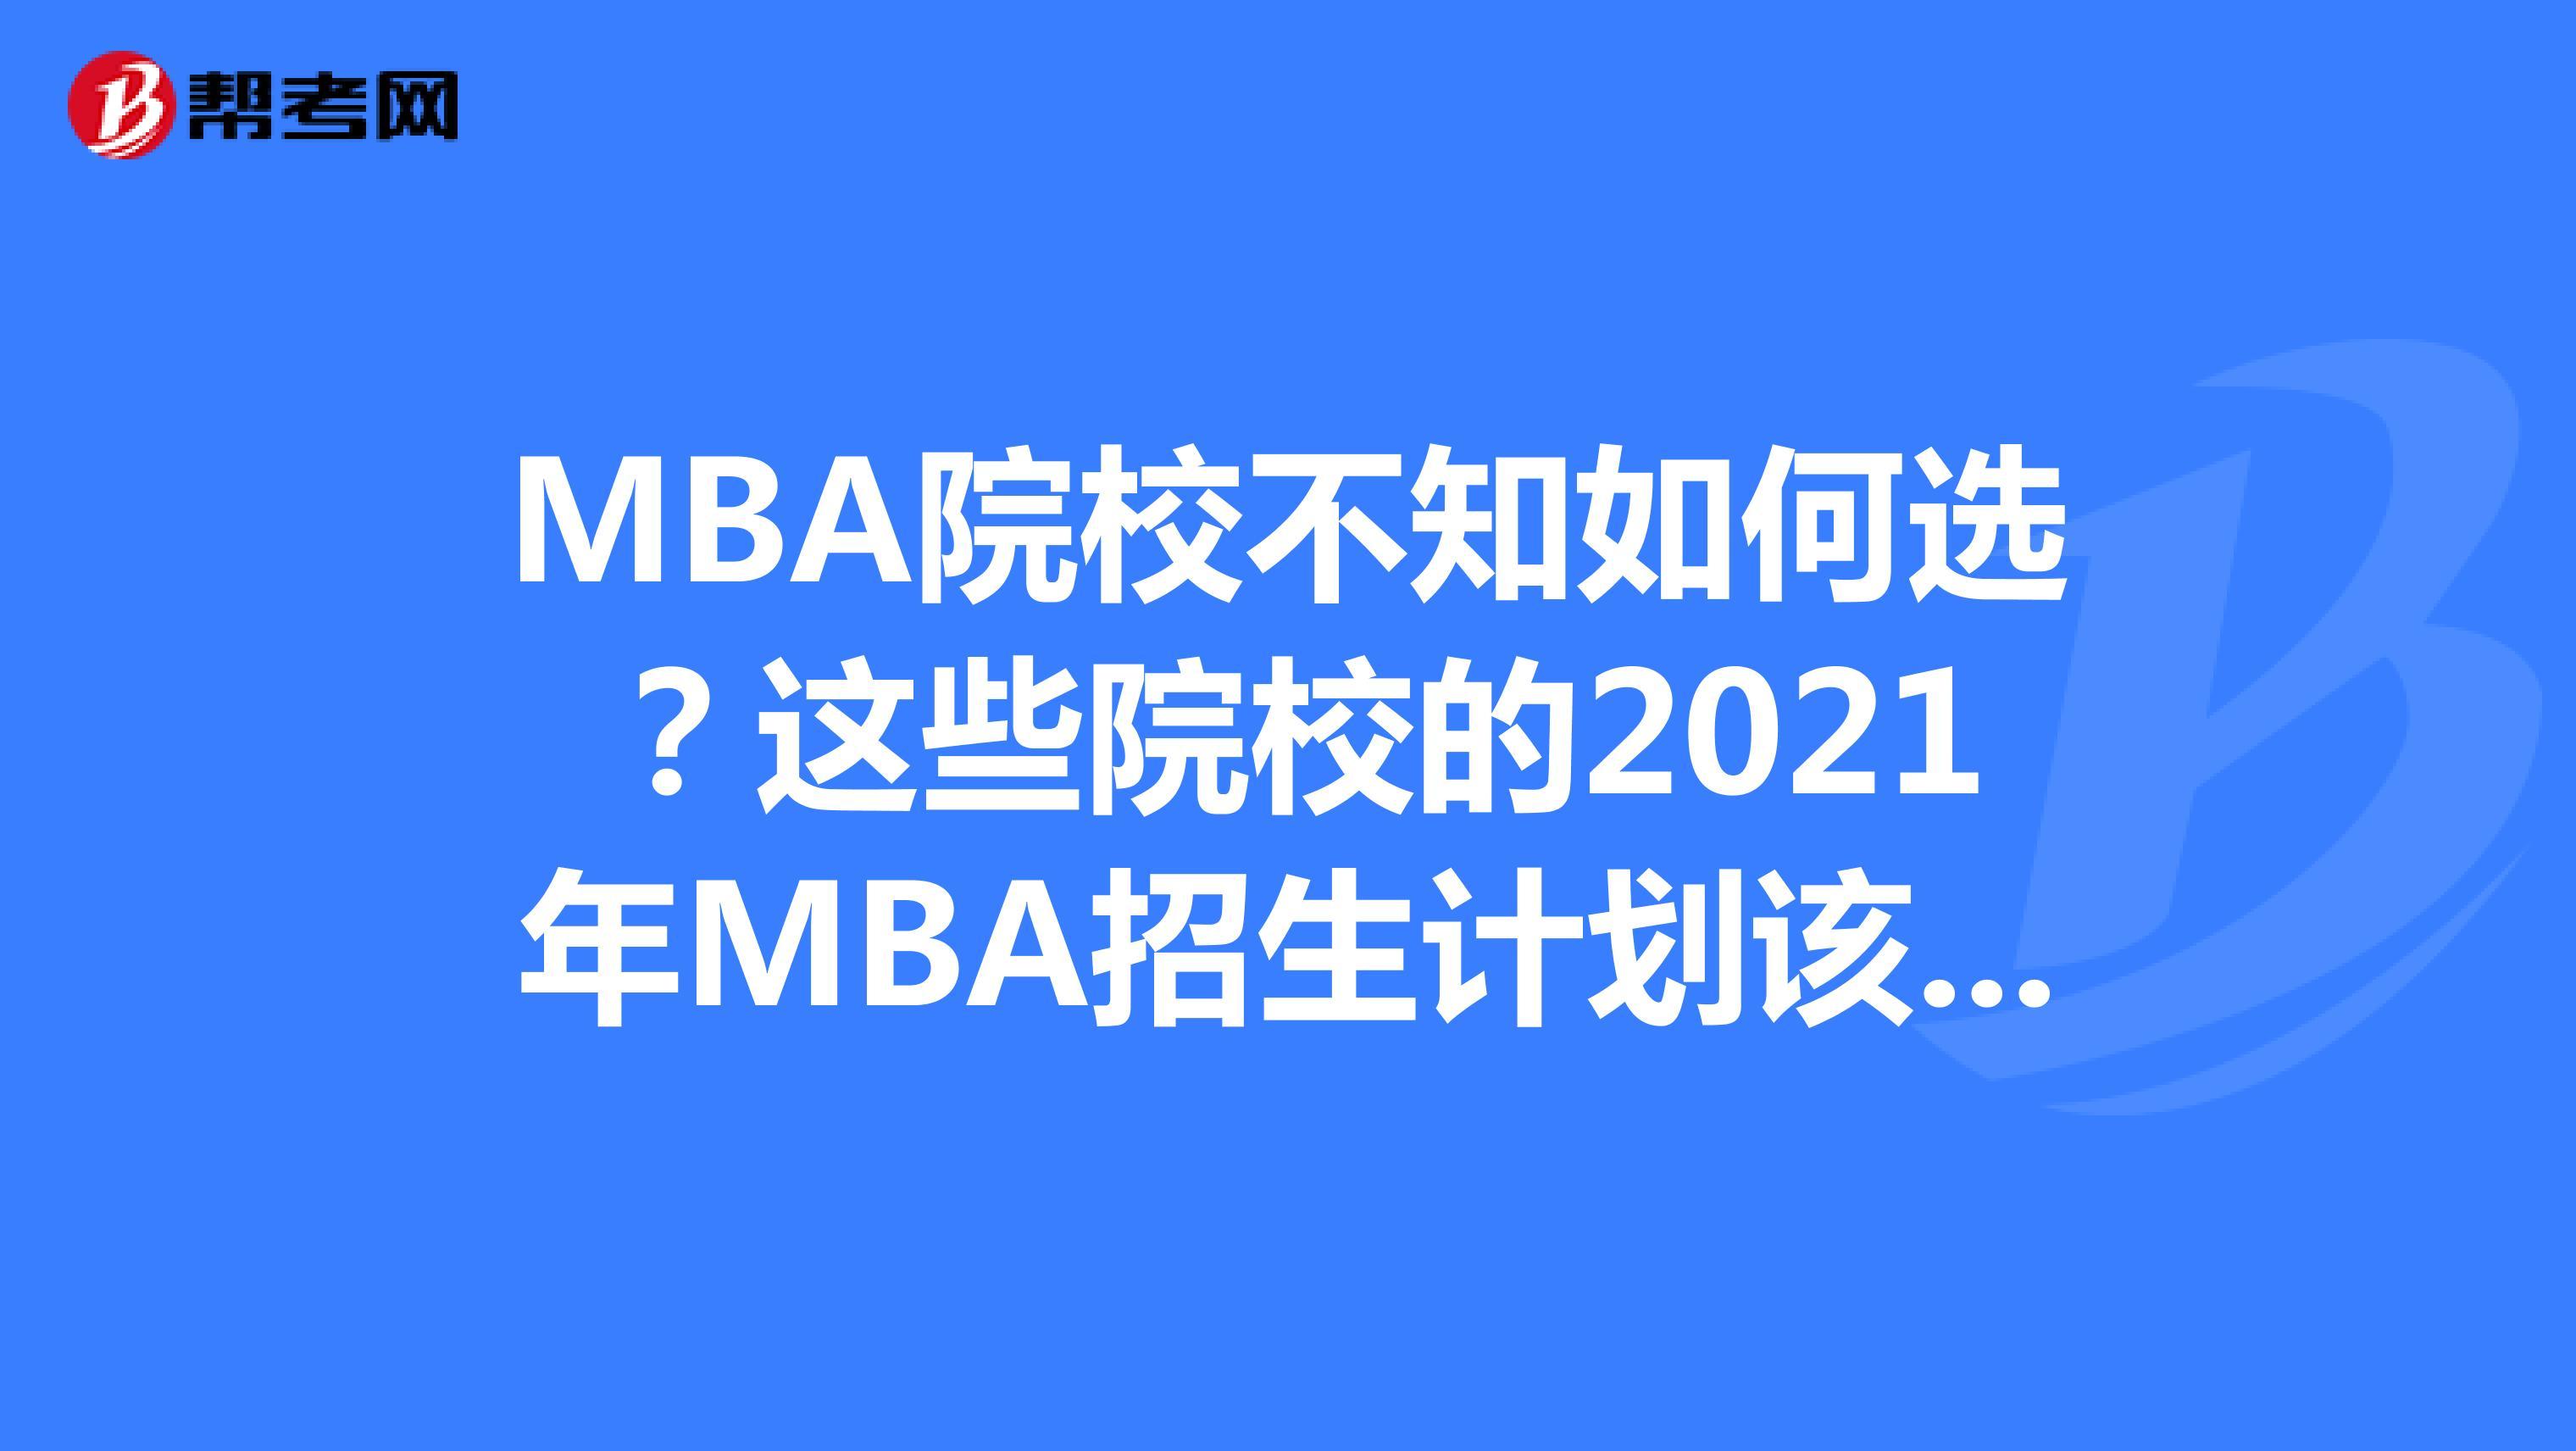 MBA院校不知如何选?这些院校的2021年MBA招生计划该看看了